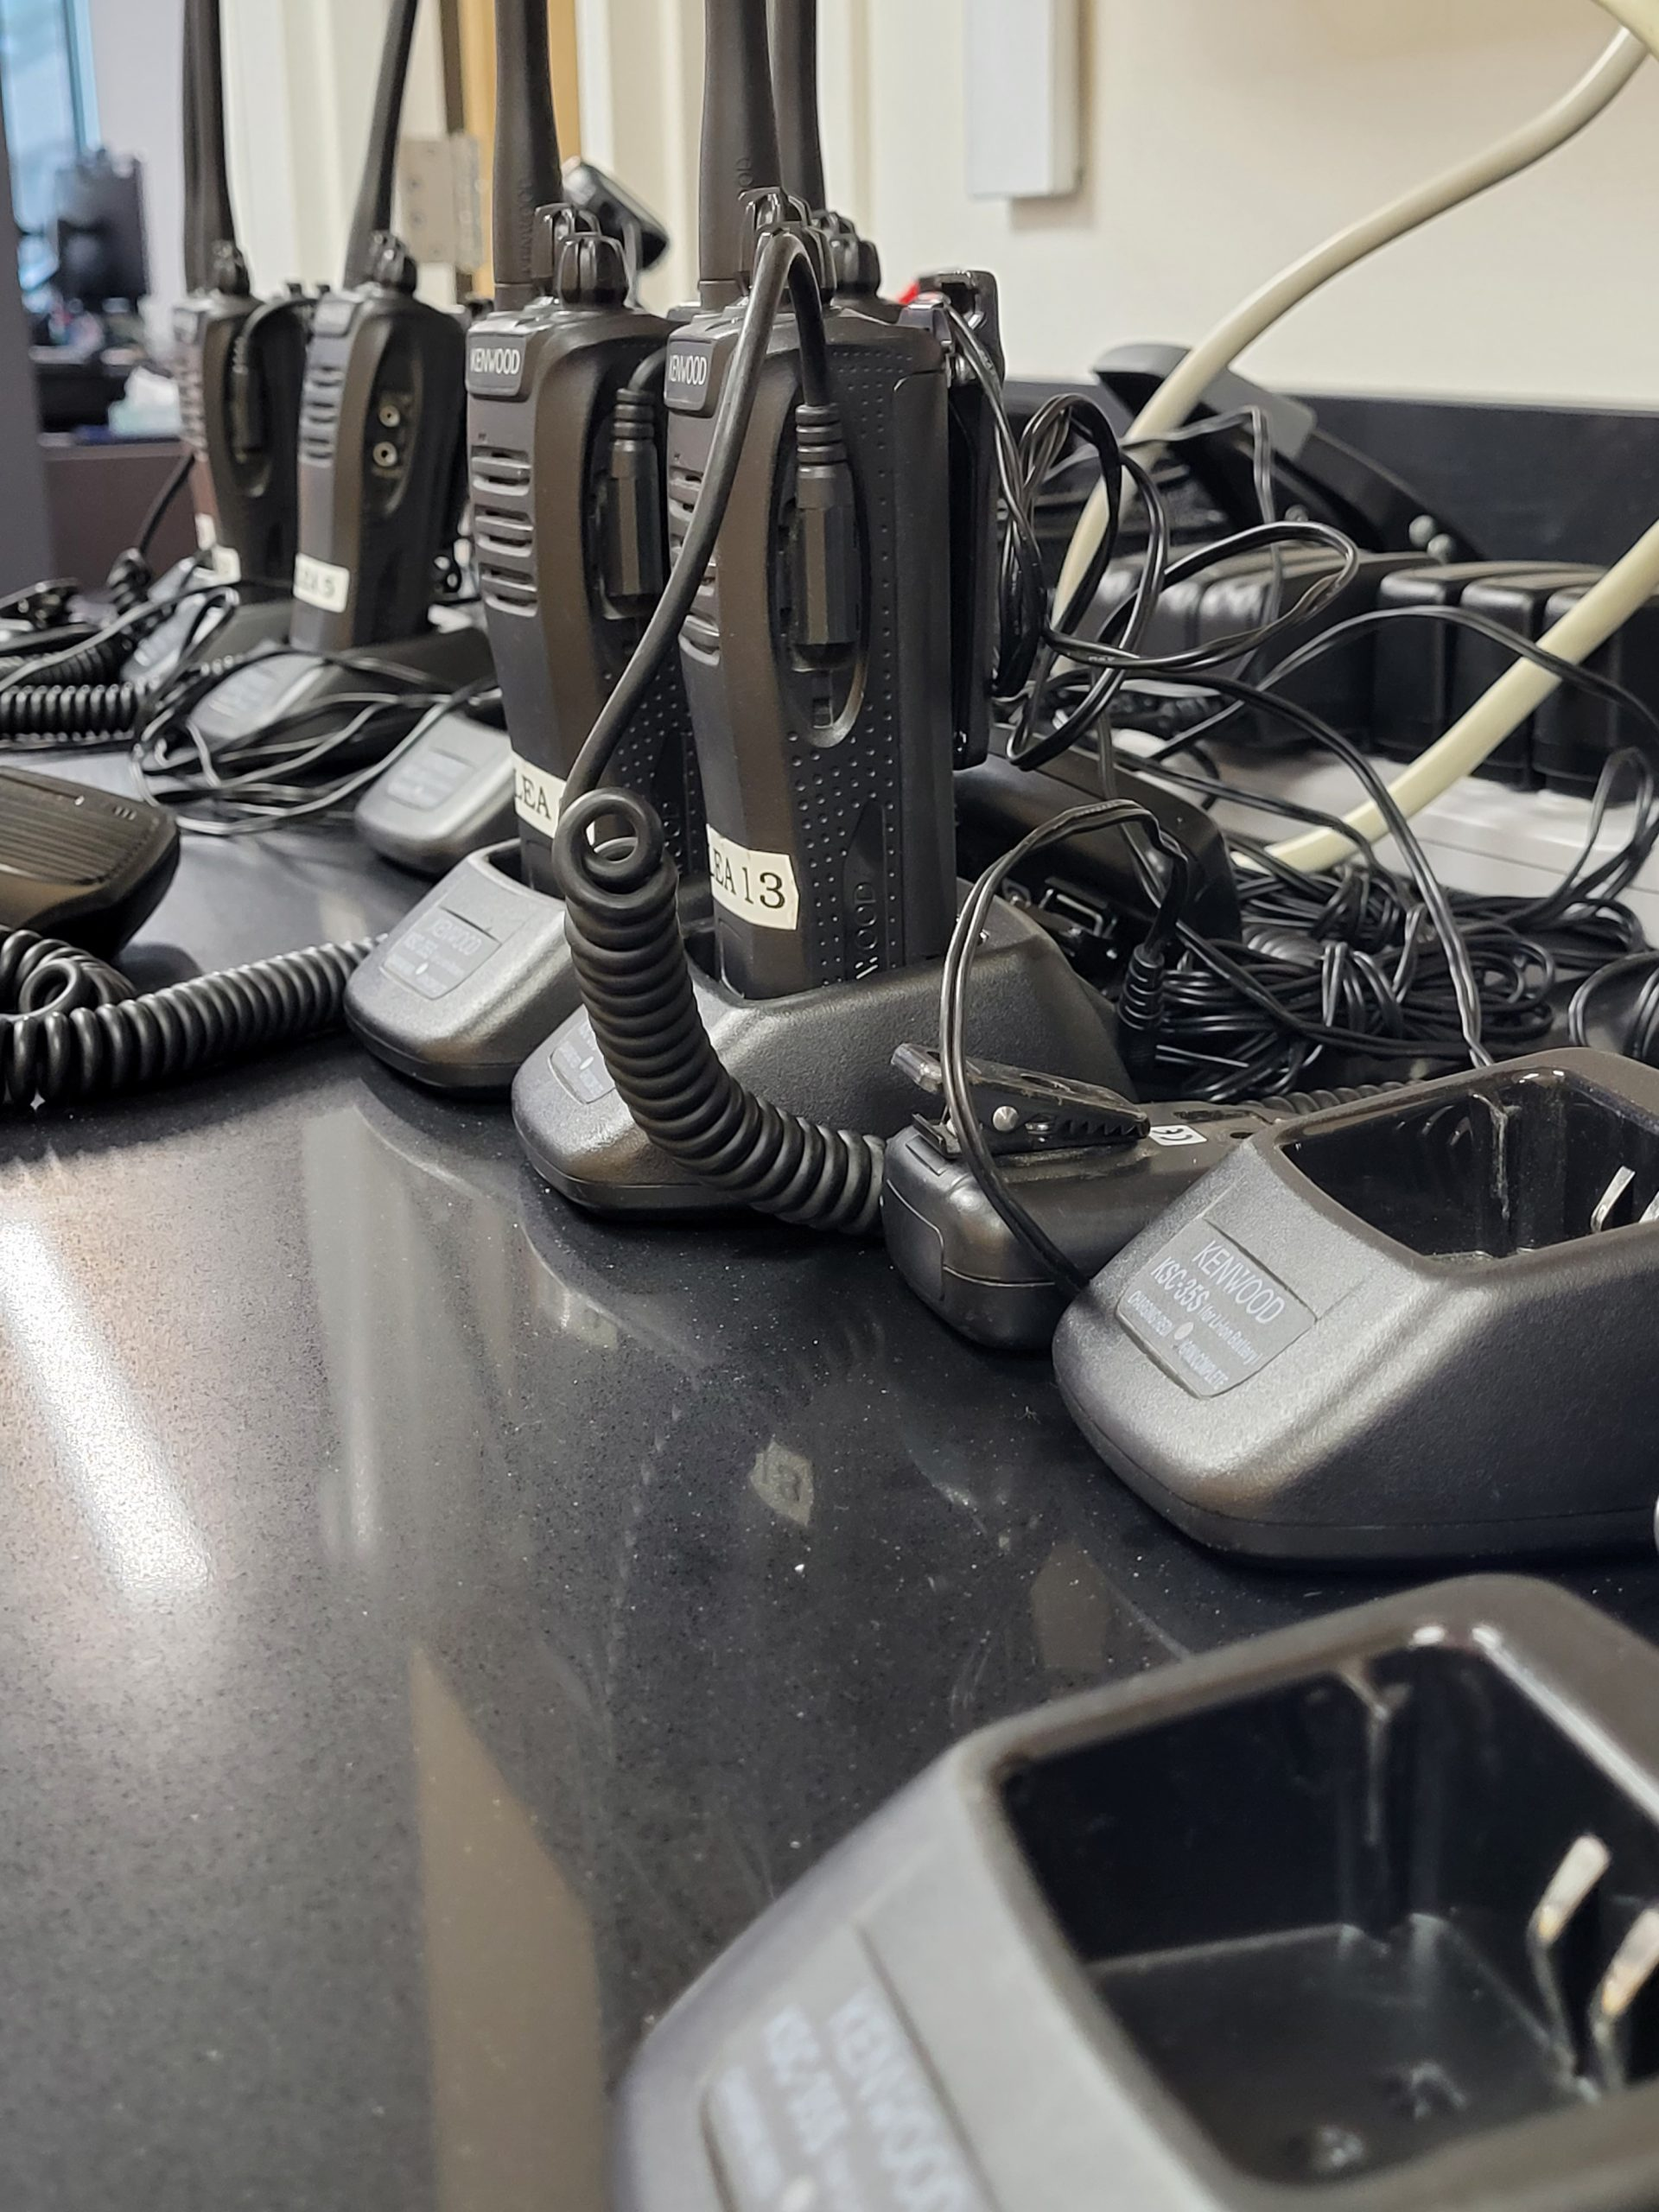 1996 ILEA to Train Telecommunicators